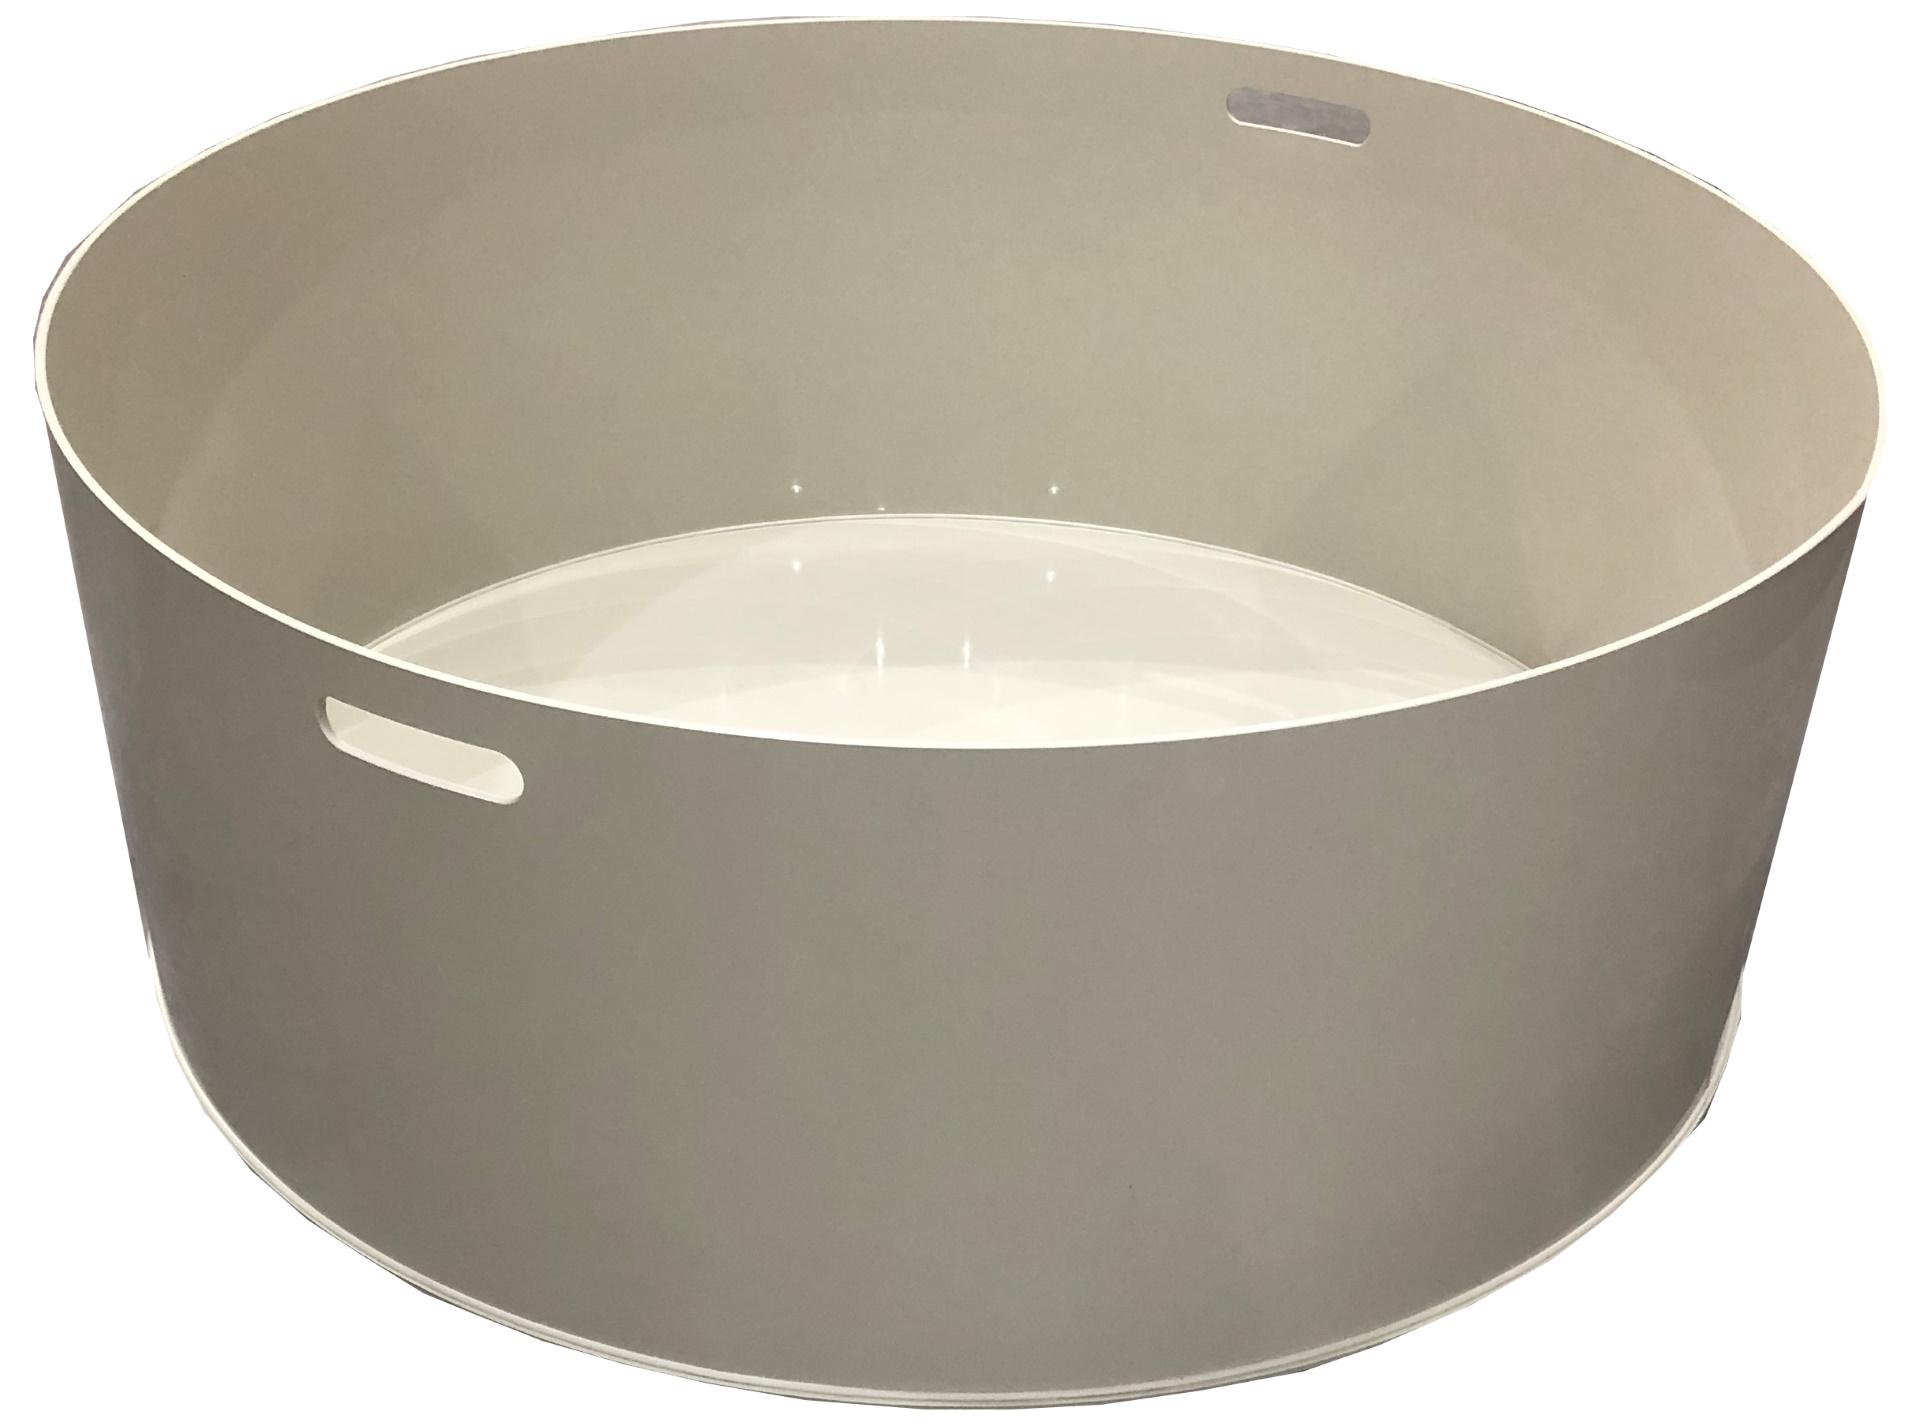 bowls_01-05-2020_groot